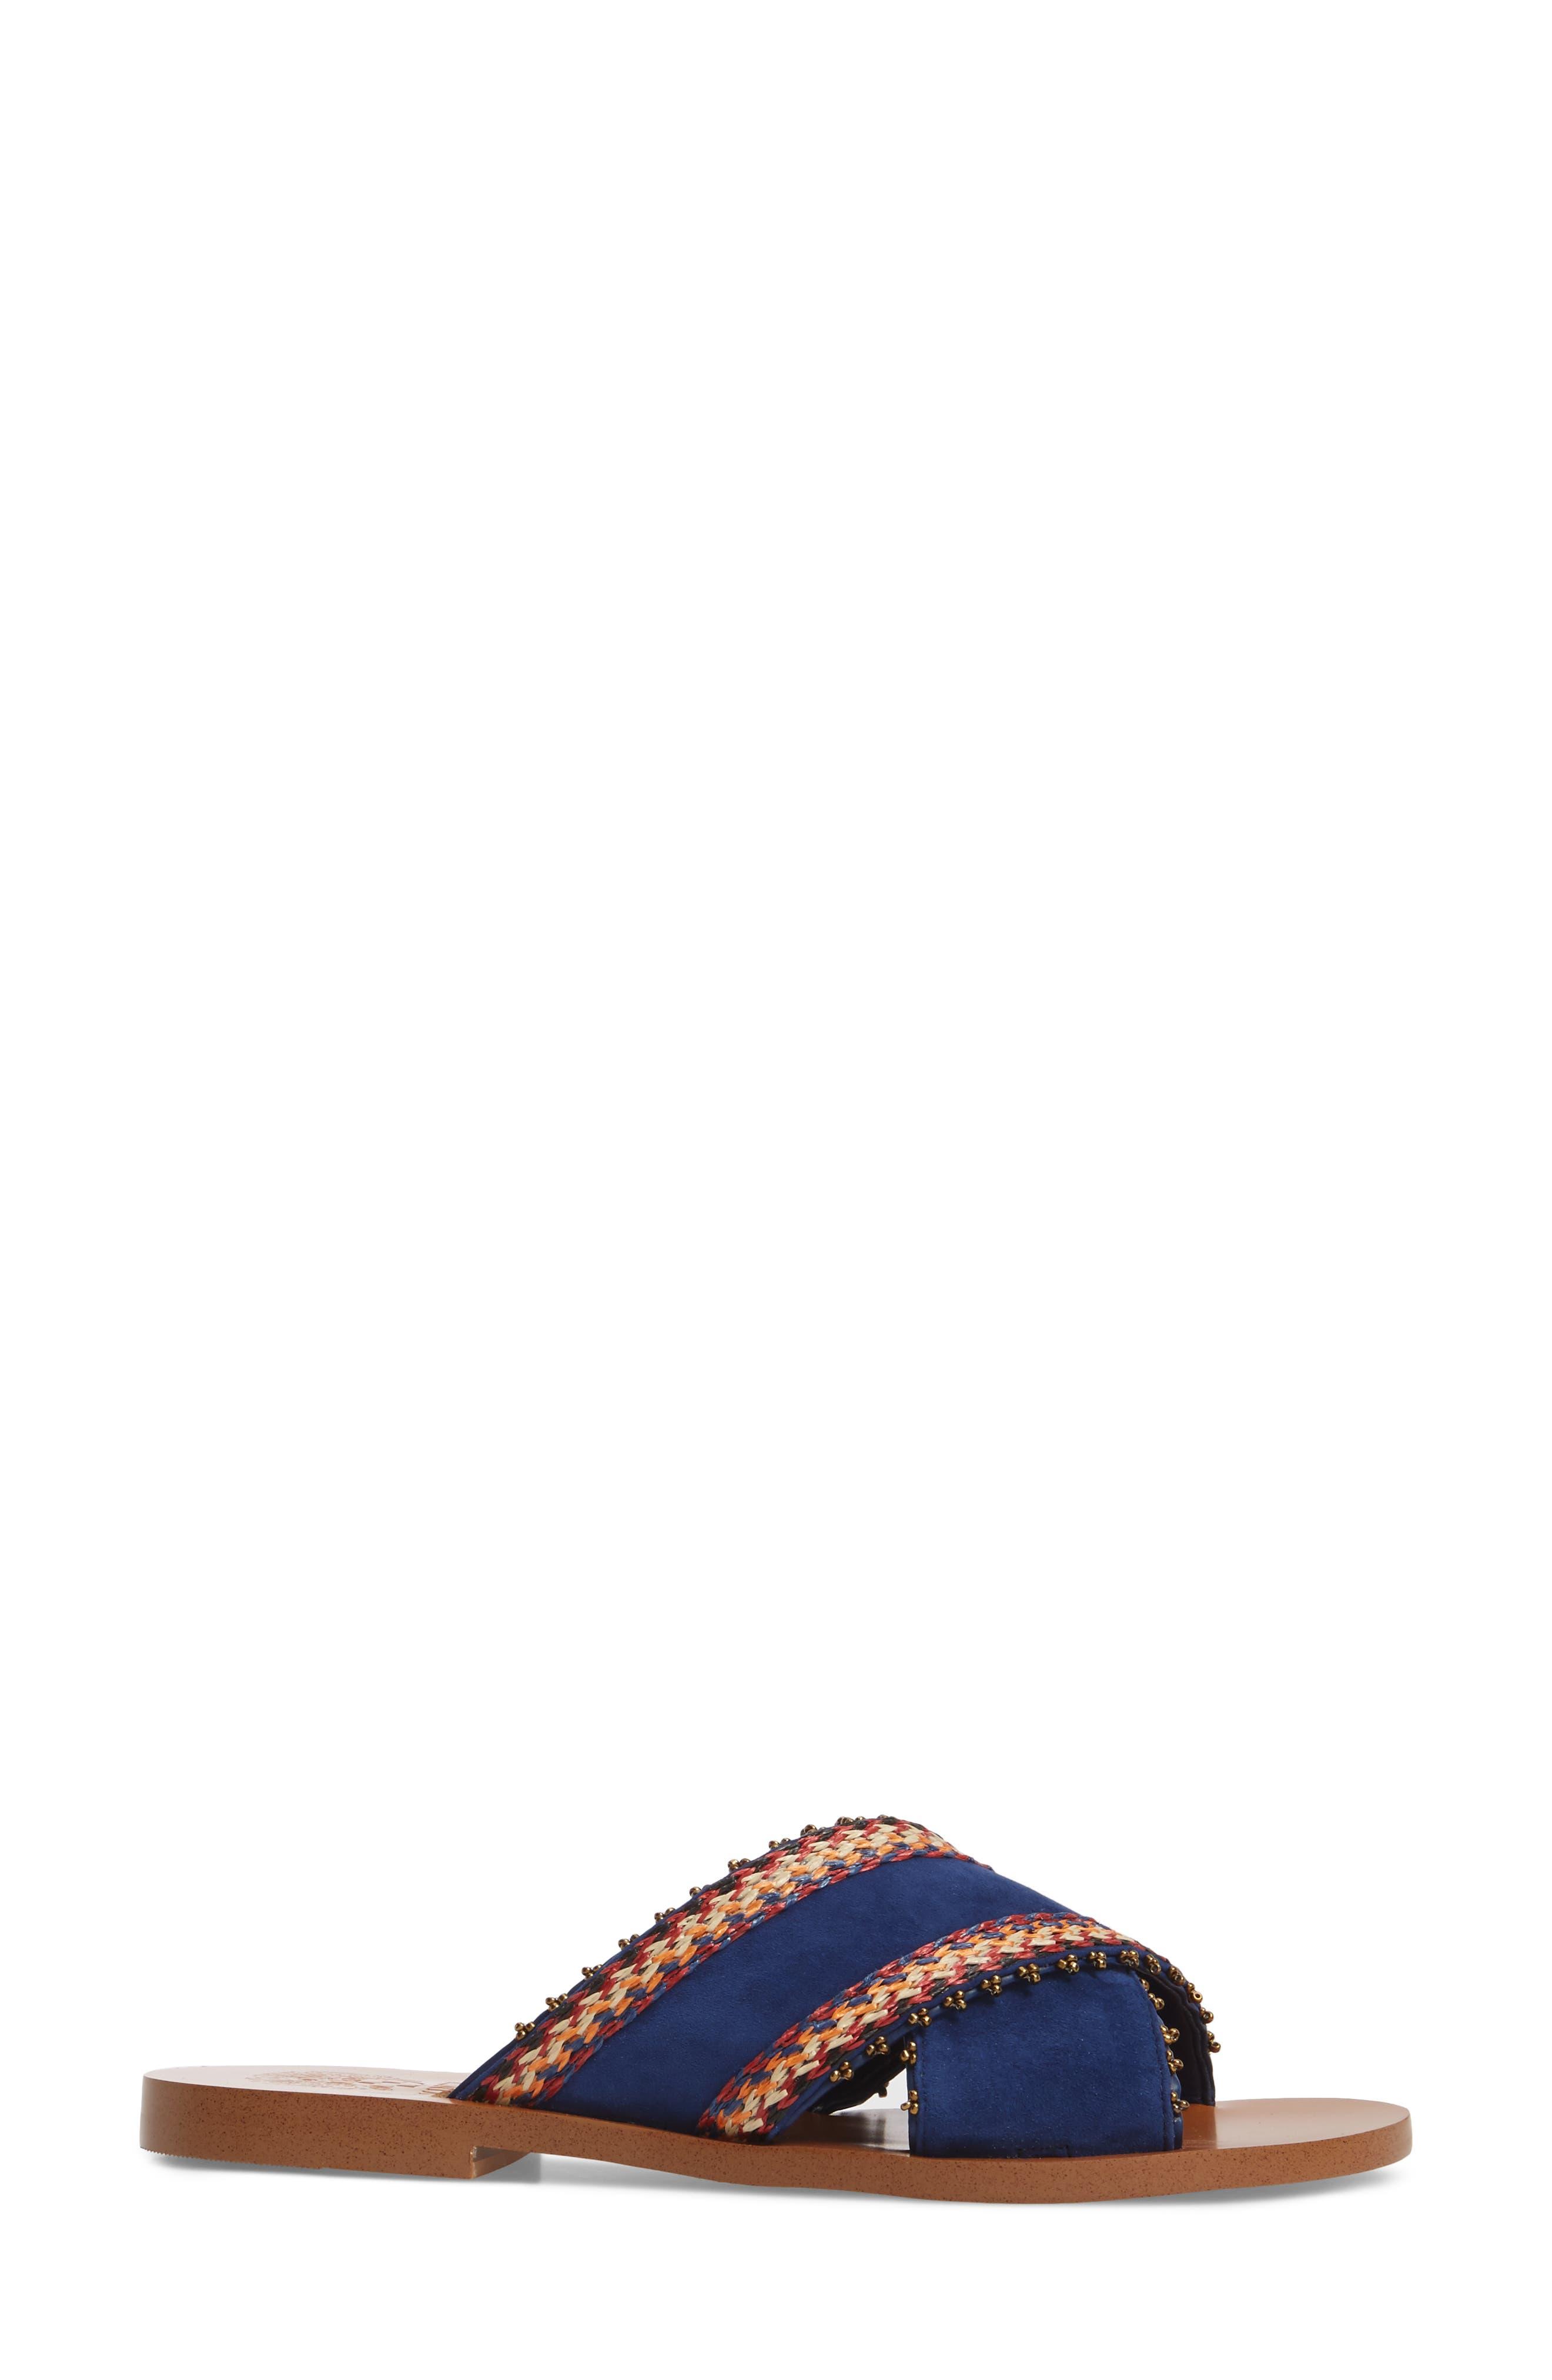 Averal Sandal,                             Alternate thumbnail 3, color,                             Moody Blues/ Red Multi